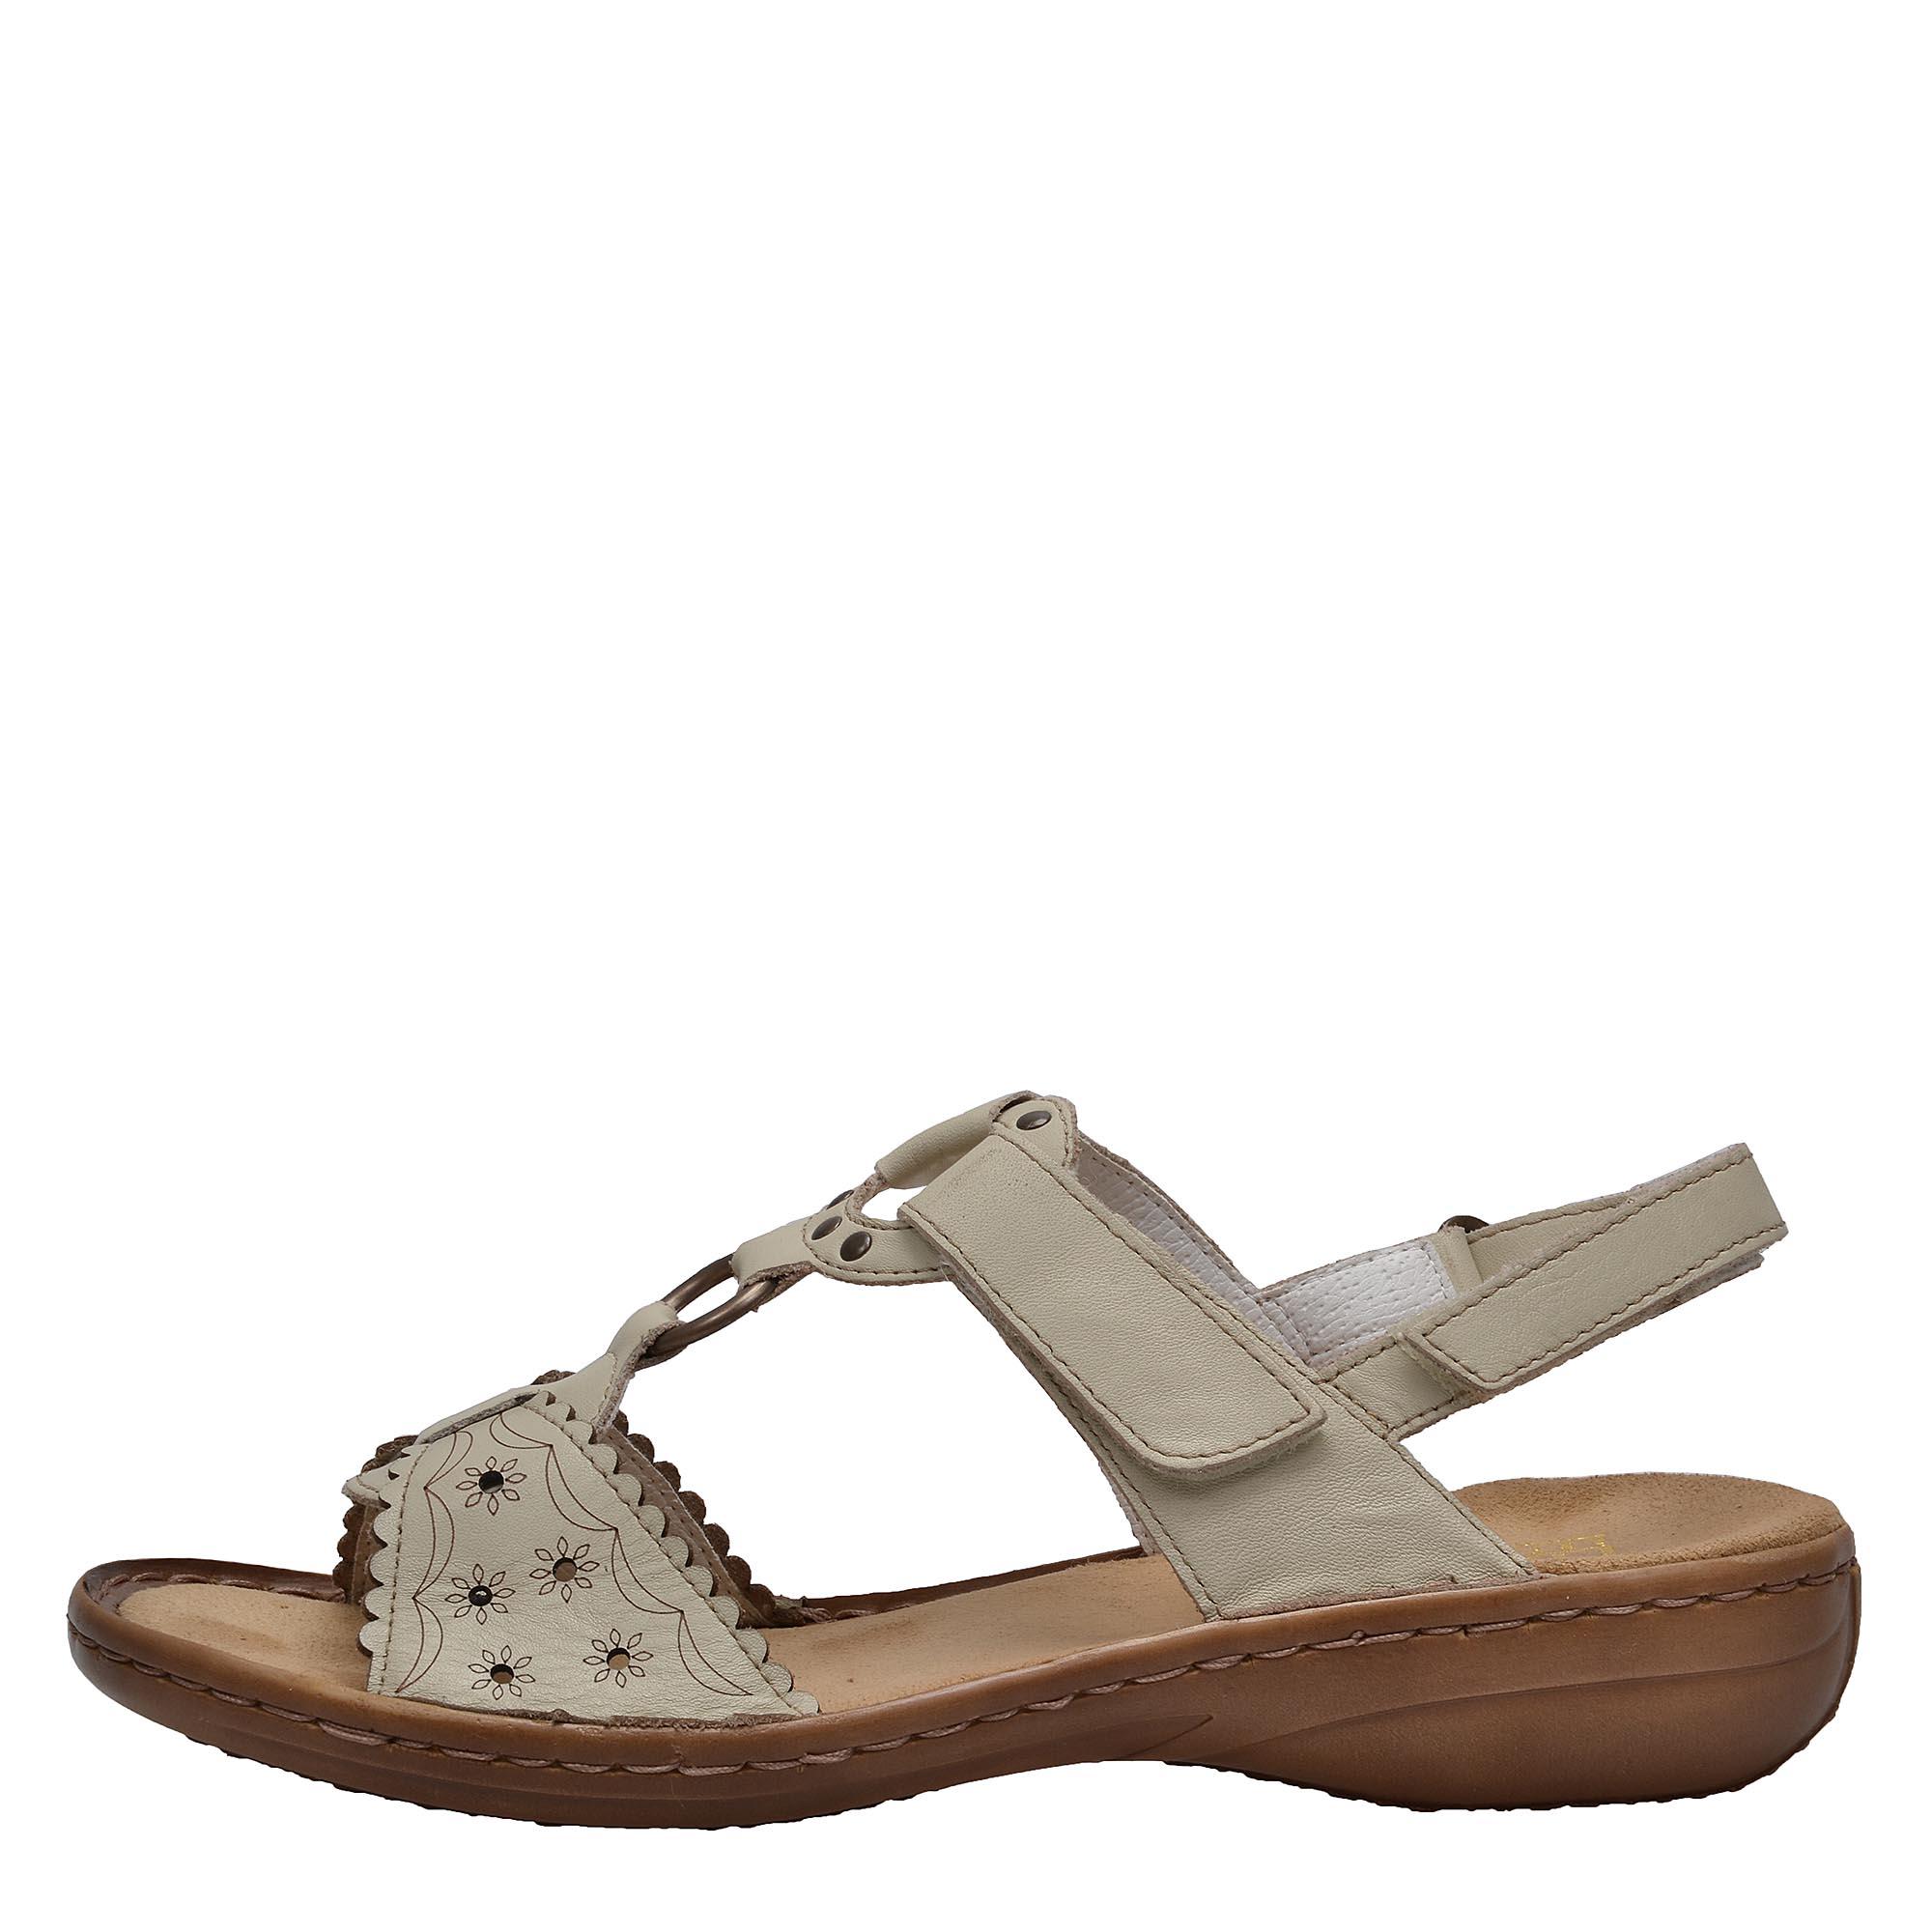 Dámská obuv RIEKER60867 80 WEISS F S 8  49b11e5c8a4